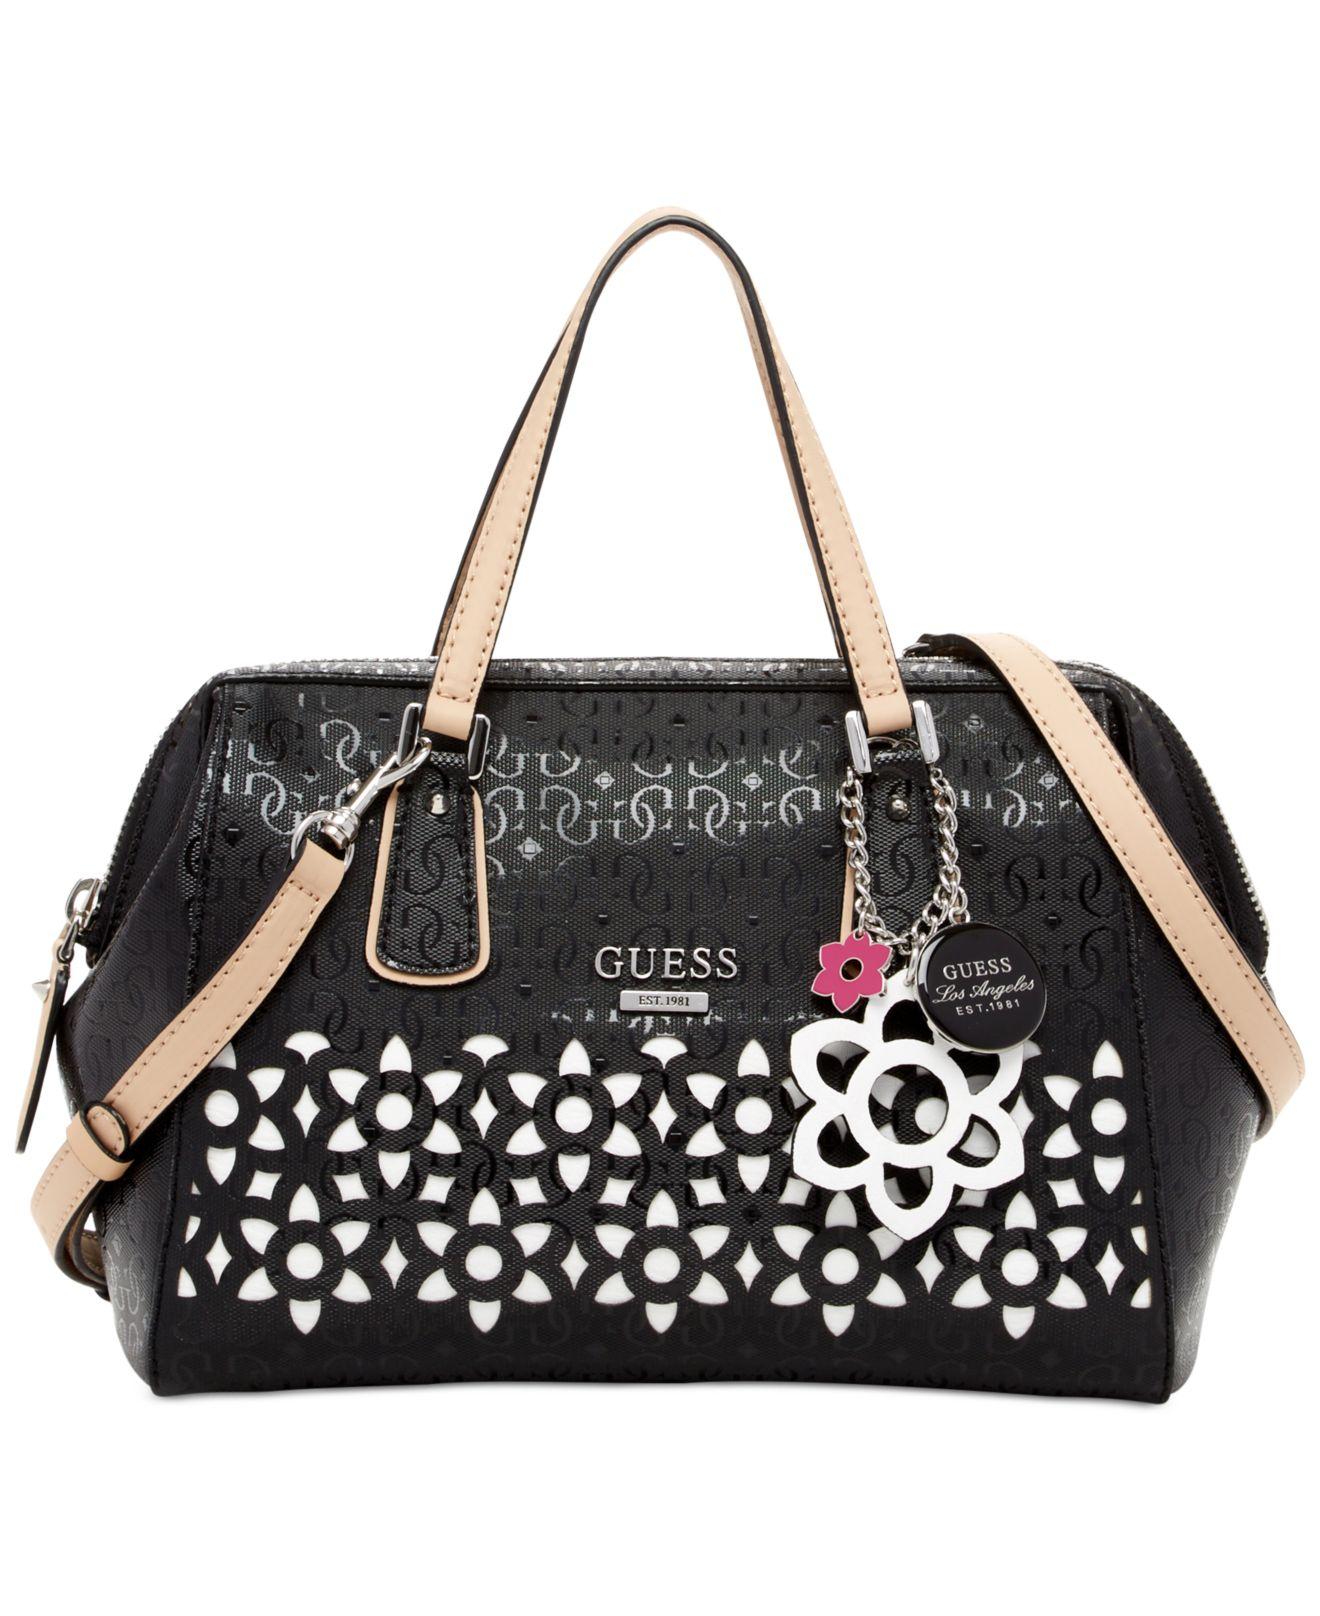 NWT GUESS Bianco Nero Laser Cutout Frame Satchel Handbag Purse Hot Pink